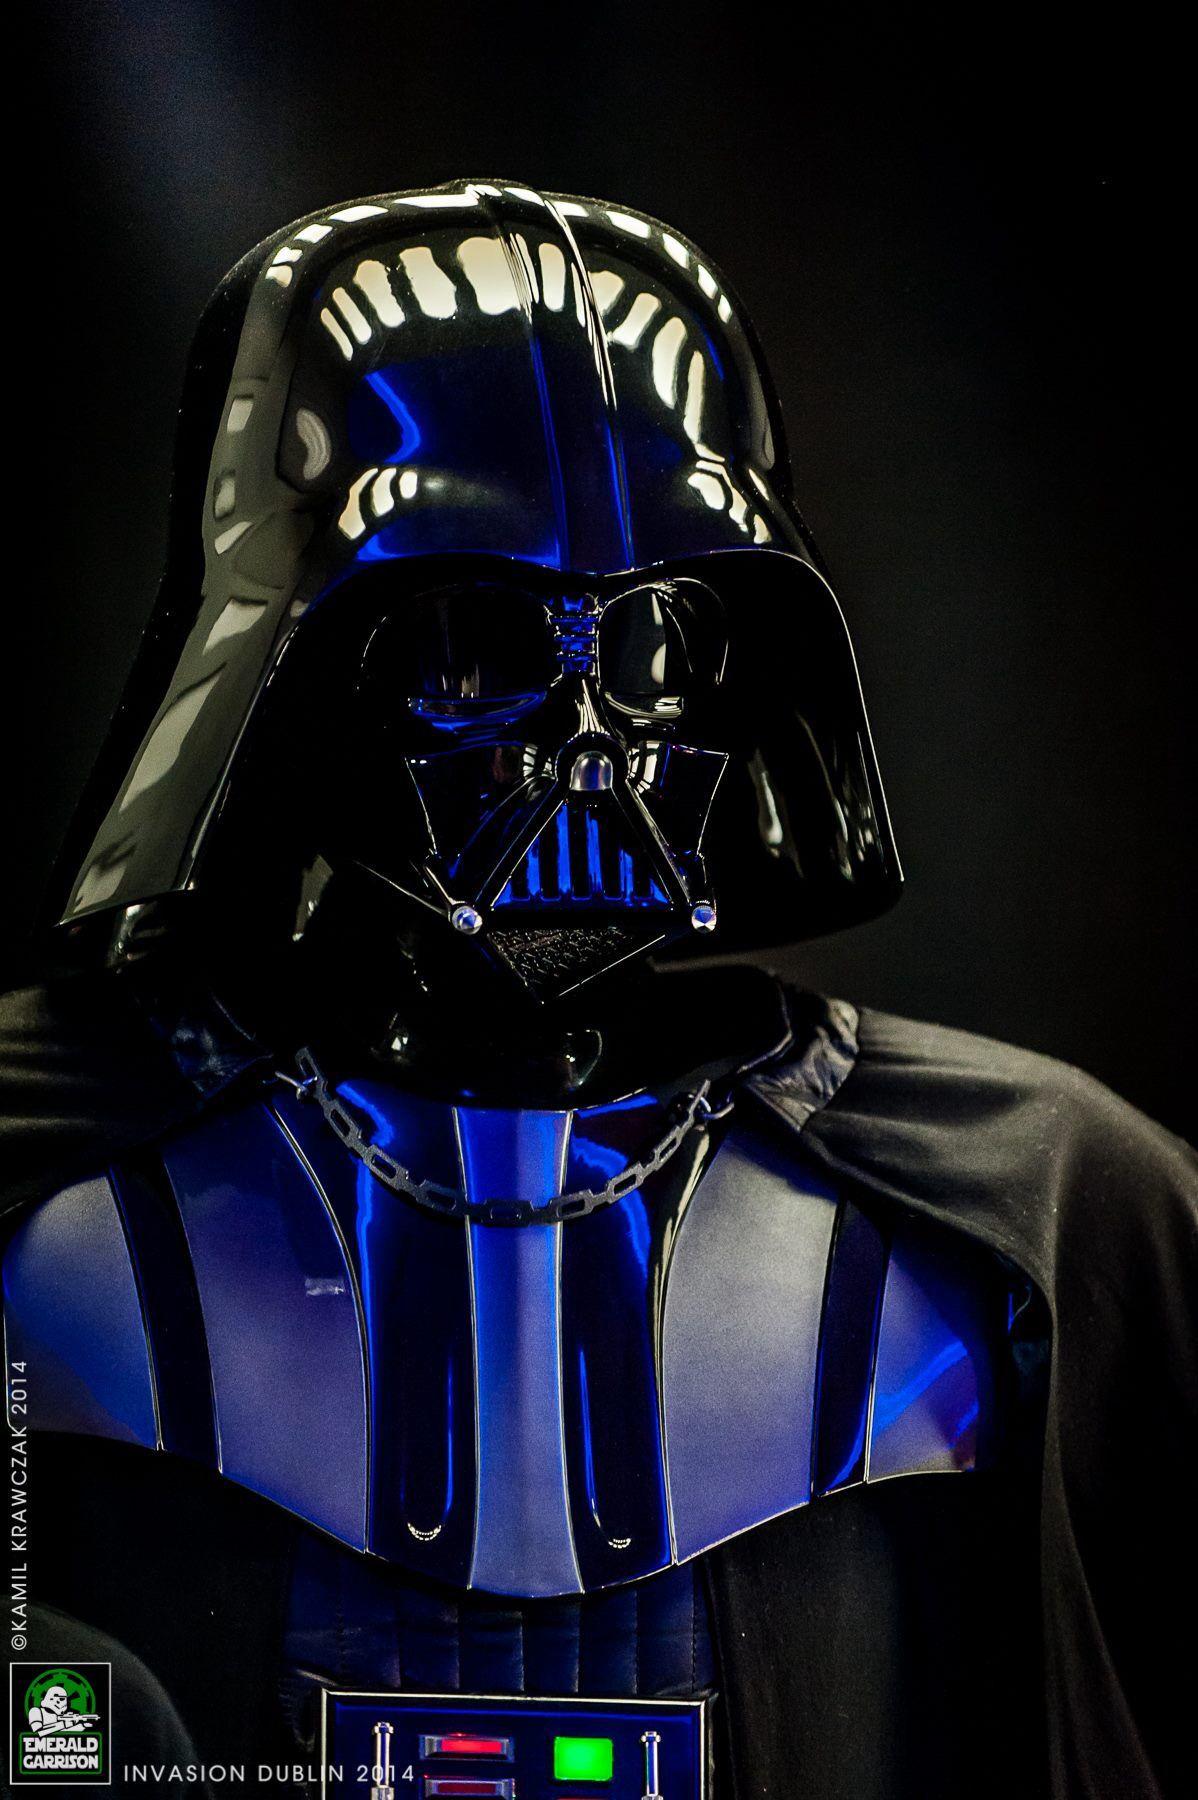 Revenge Of The Sith Darth Vader Costume Worn By Julian Checkley Darth Vader Costumes Darth Vader Tattoo Darth Vader